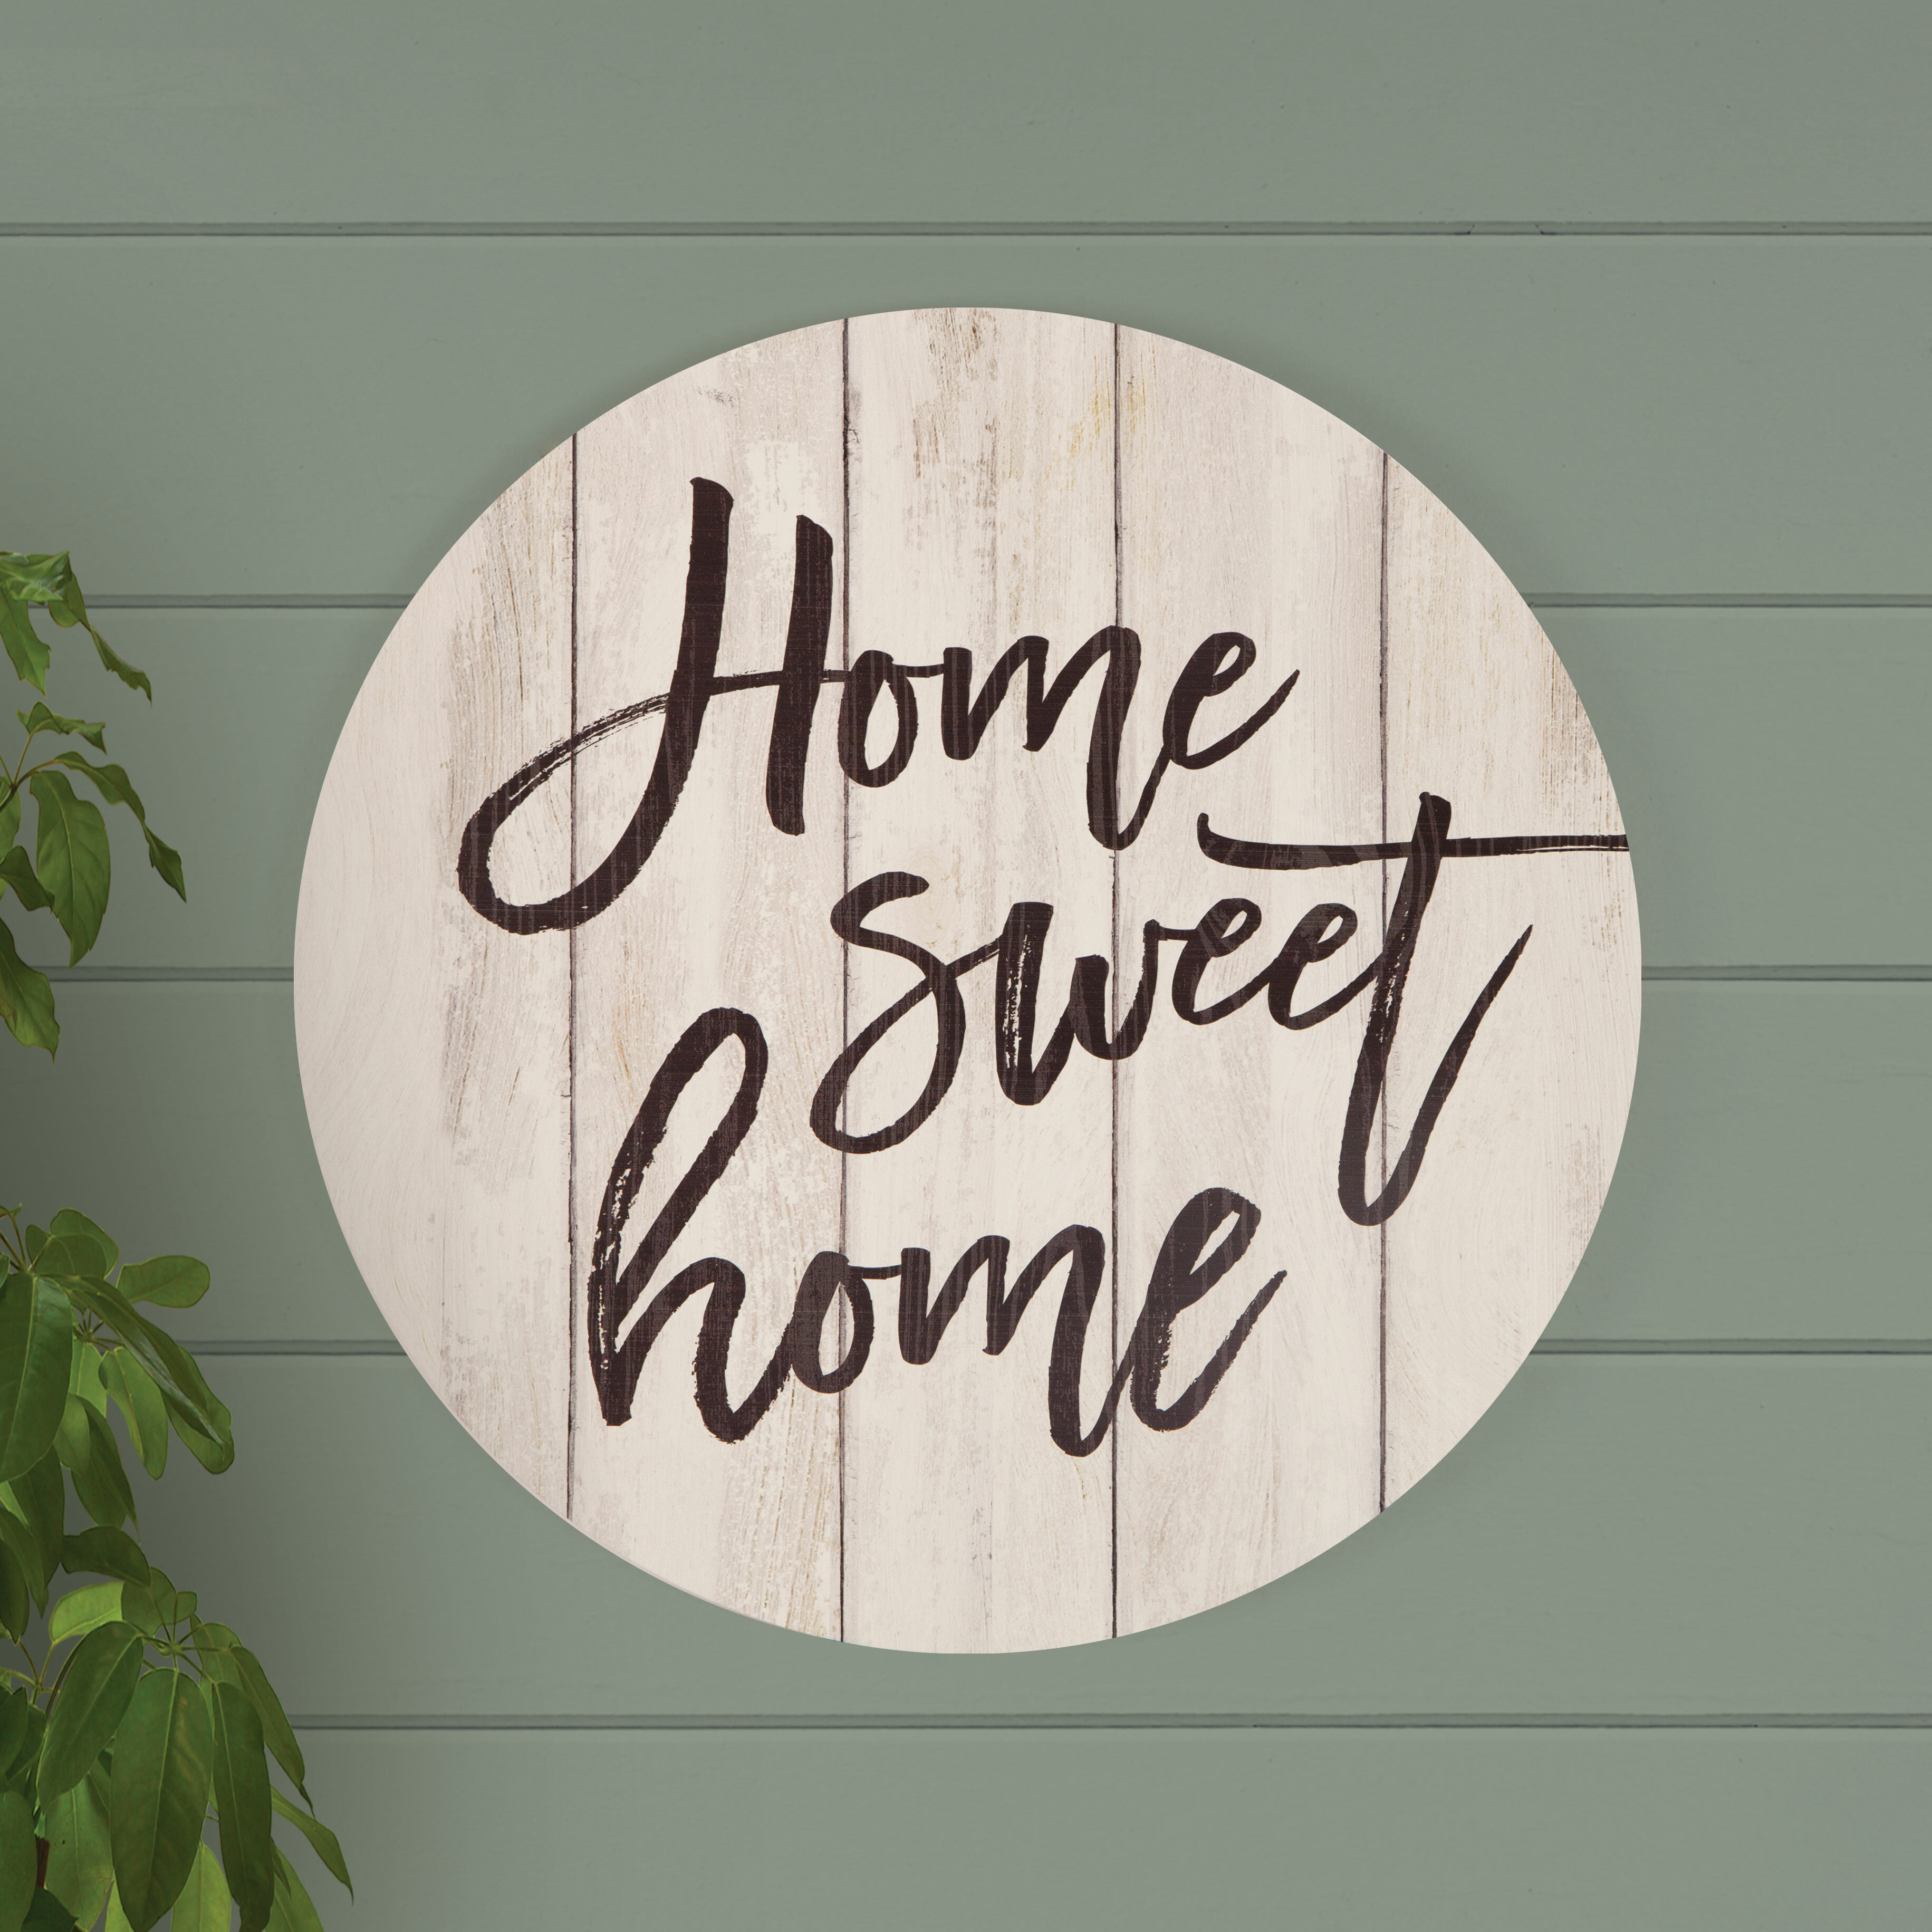 Home Sweet Home Wall Decor   Wayfair With Regard To Laser Engraved Home Sweet Home Wall Decor (View 14 of 30)